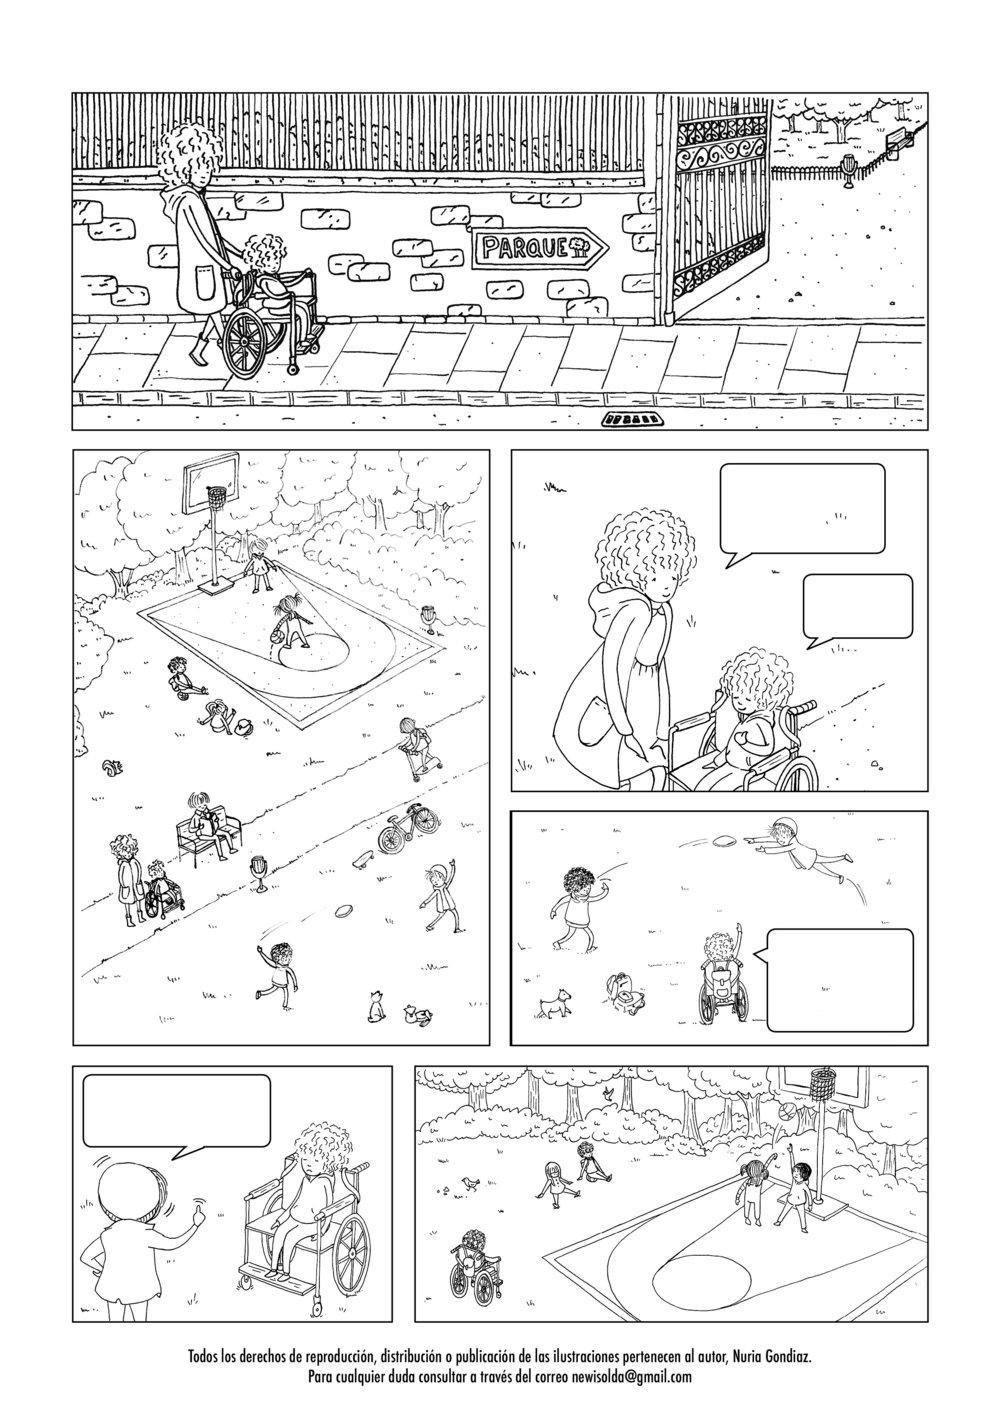 comic_integracion.jpg